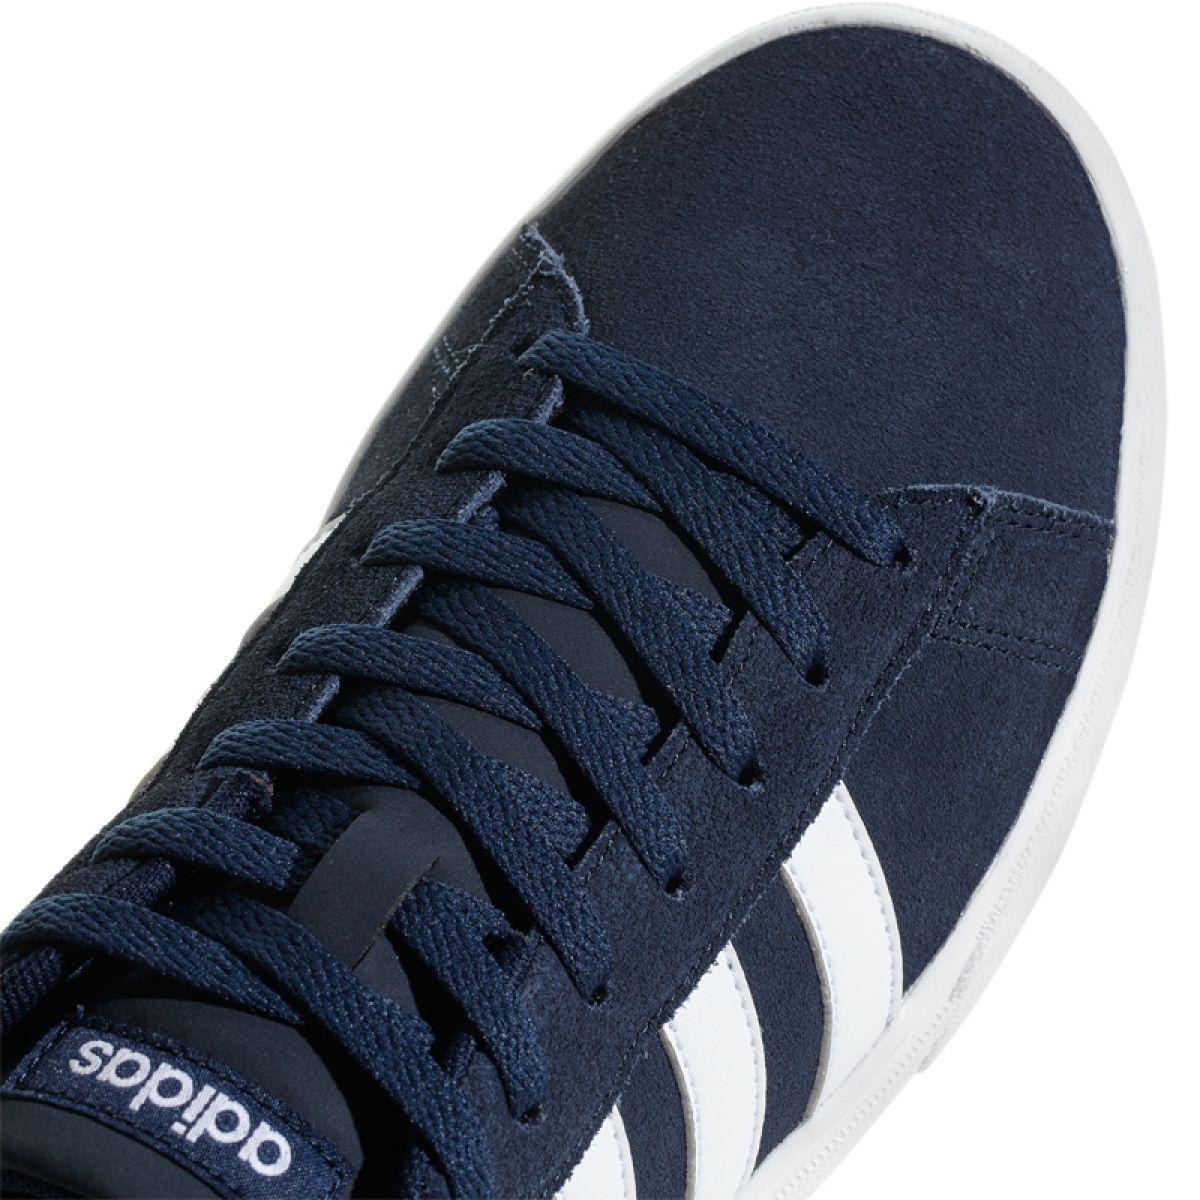 Granatowe Buty adidas Daily 2.0 M DB0271 ButyModne.pl